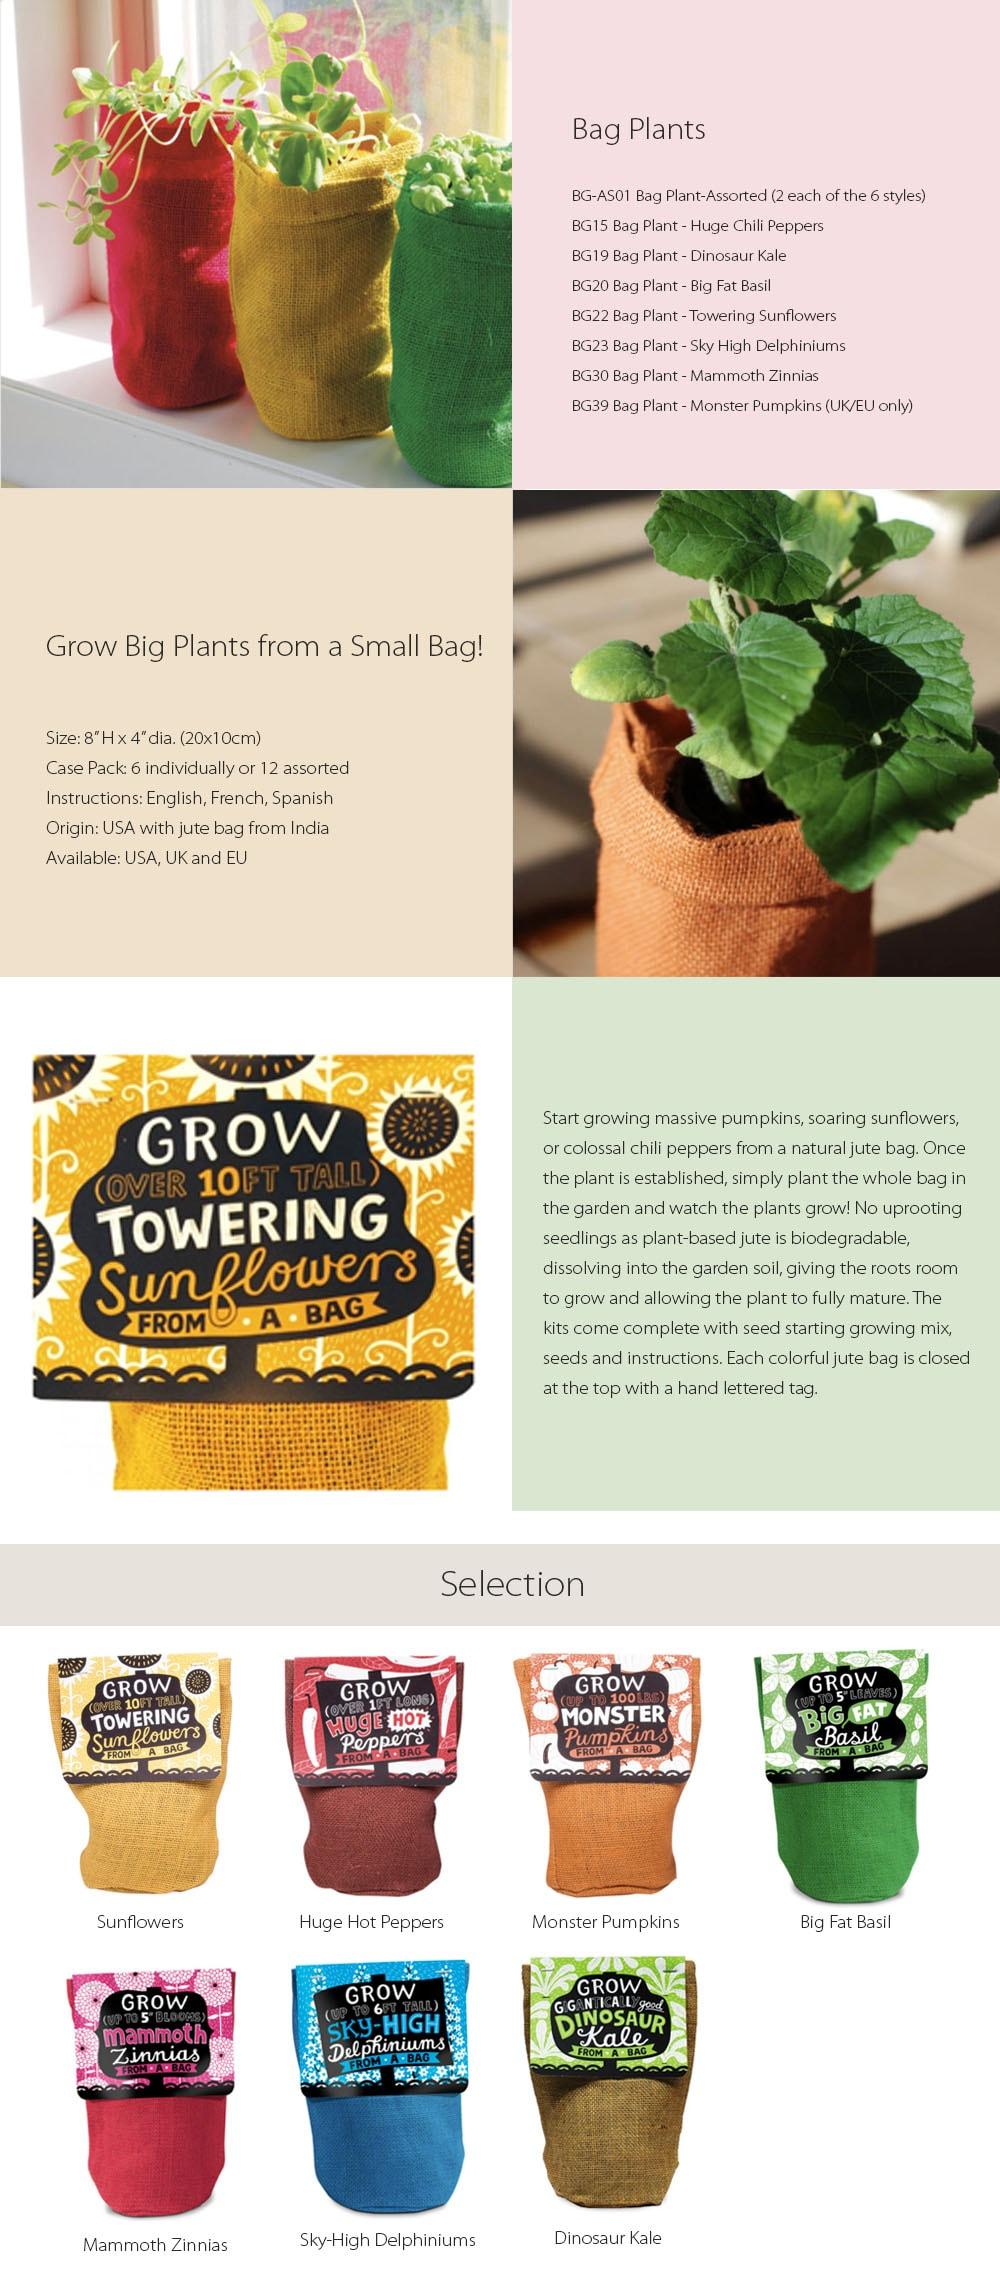 Bag Plants Grow Big Plants from Small Bags!